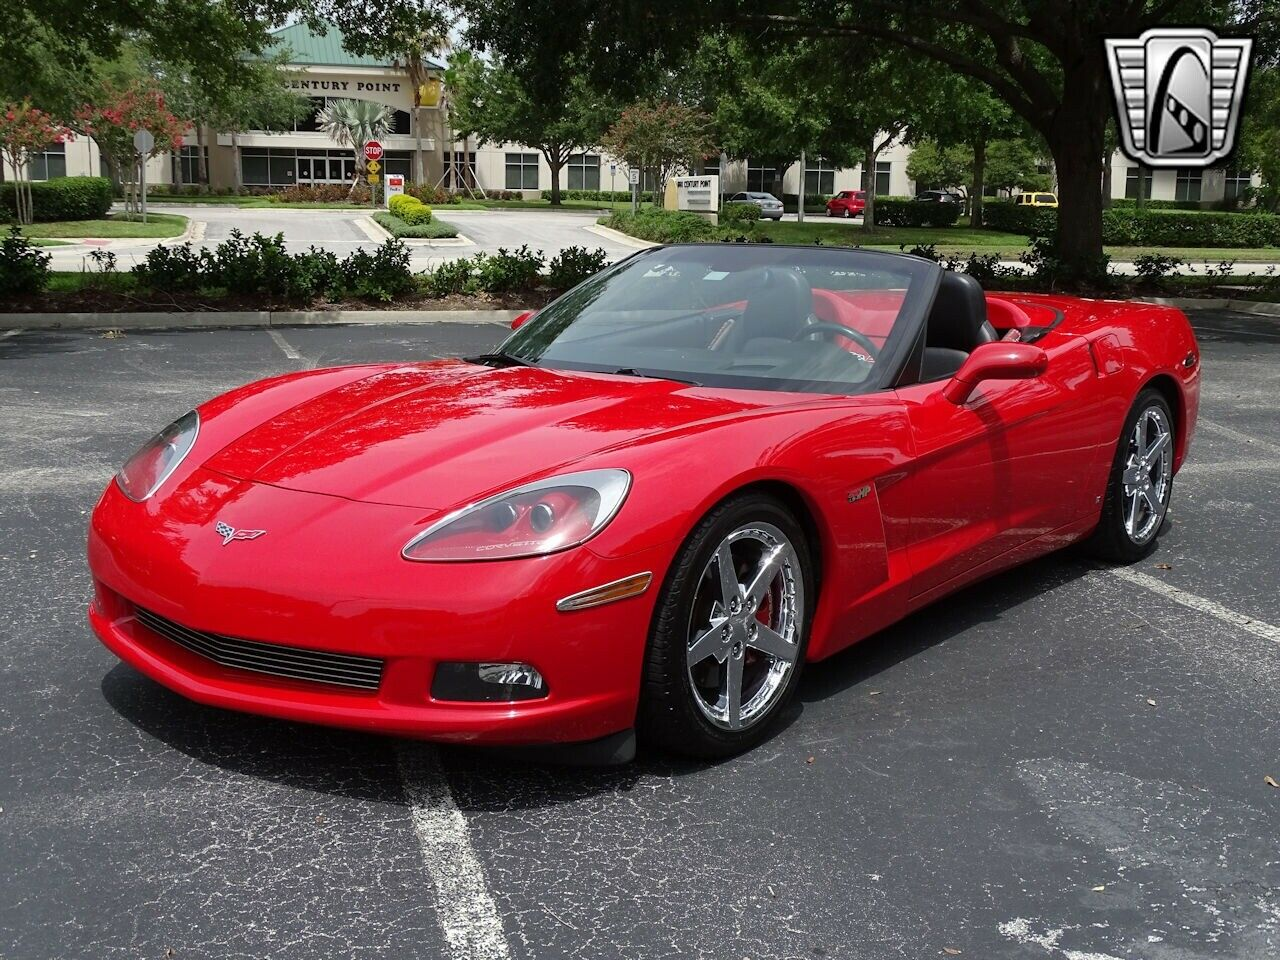 2006 Red Chevrolet Corvette     C6 Corvette Photo 4